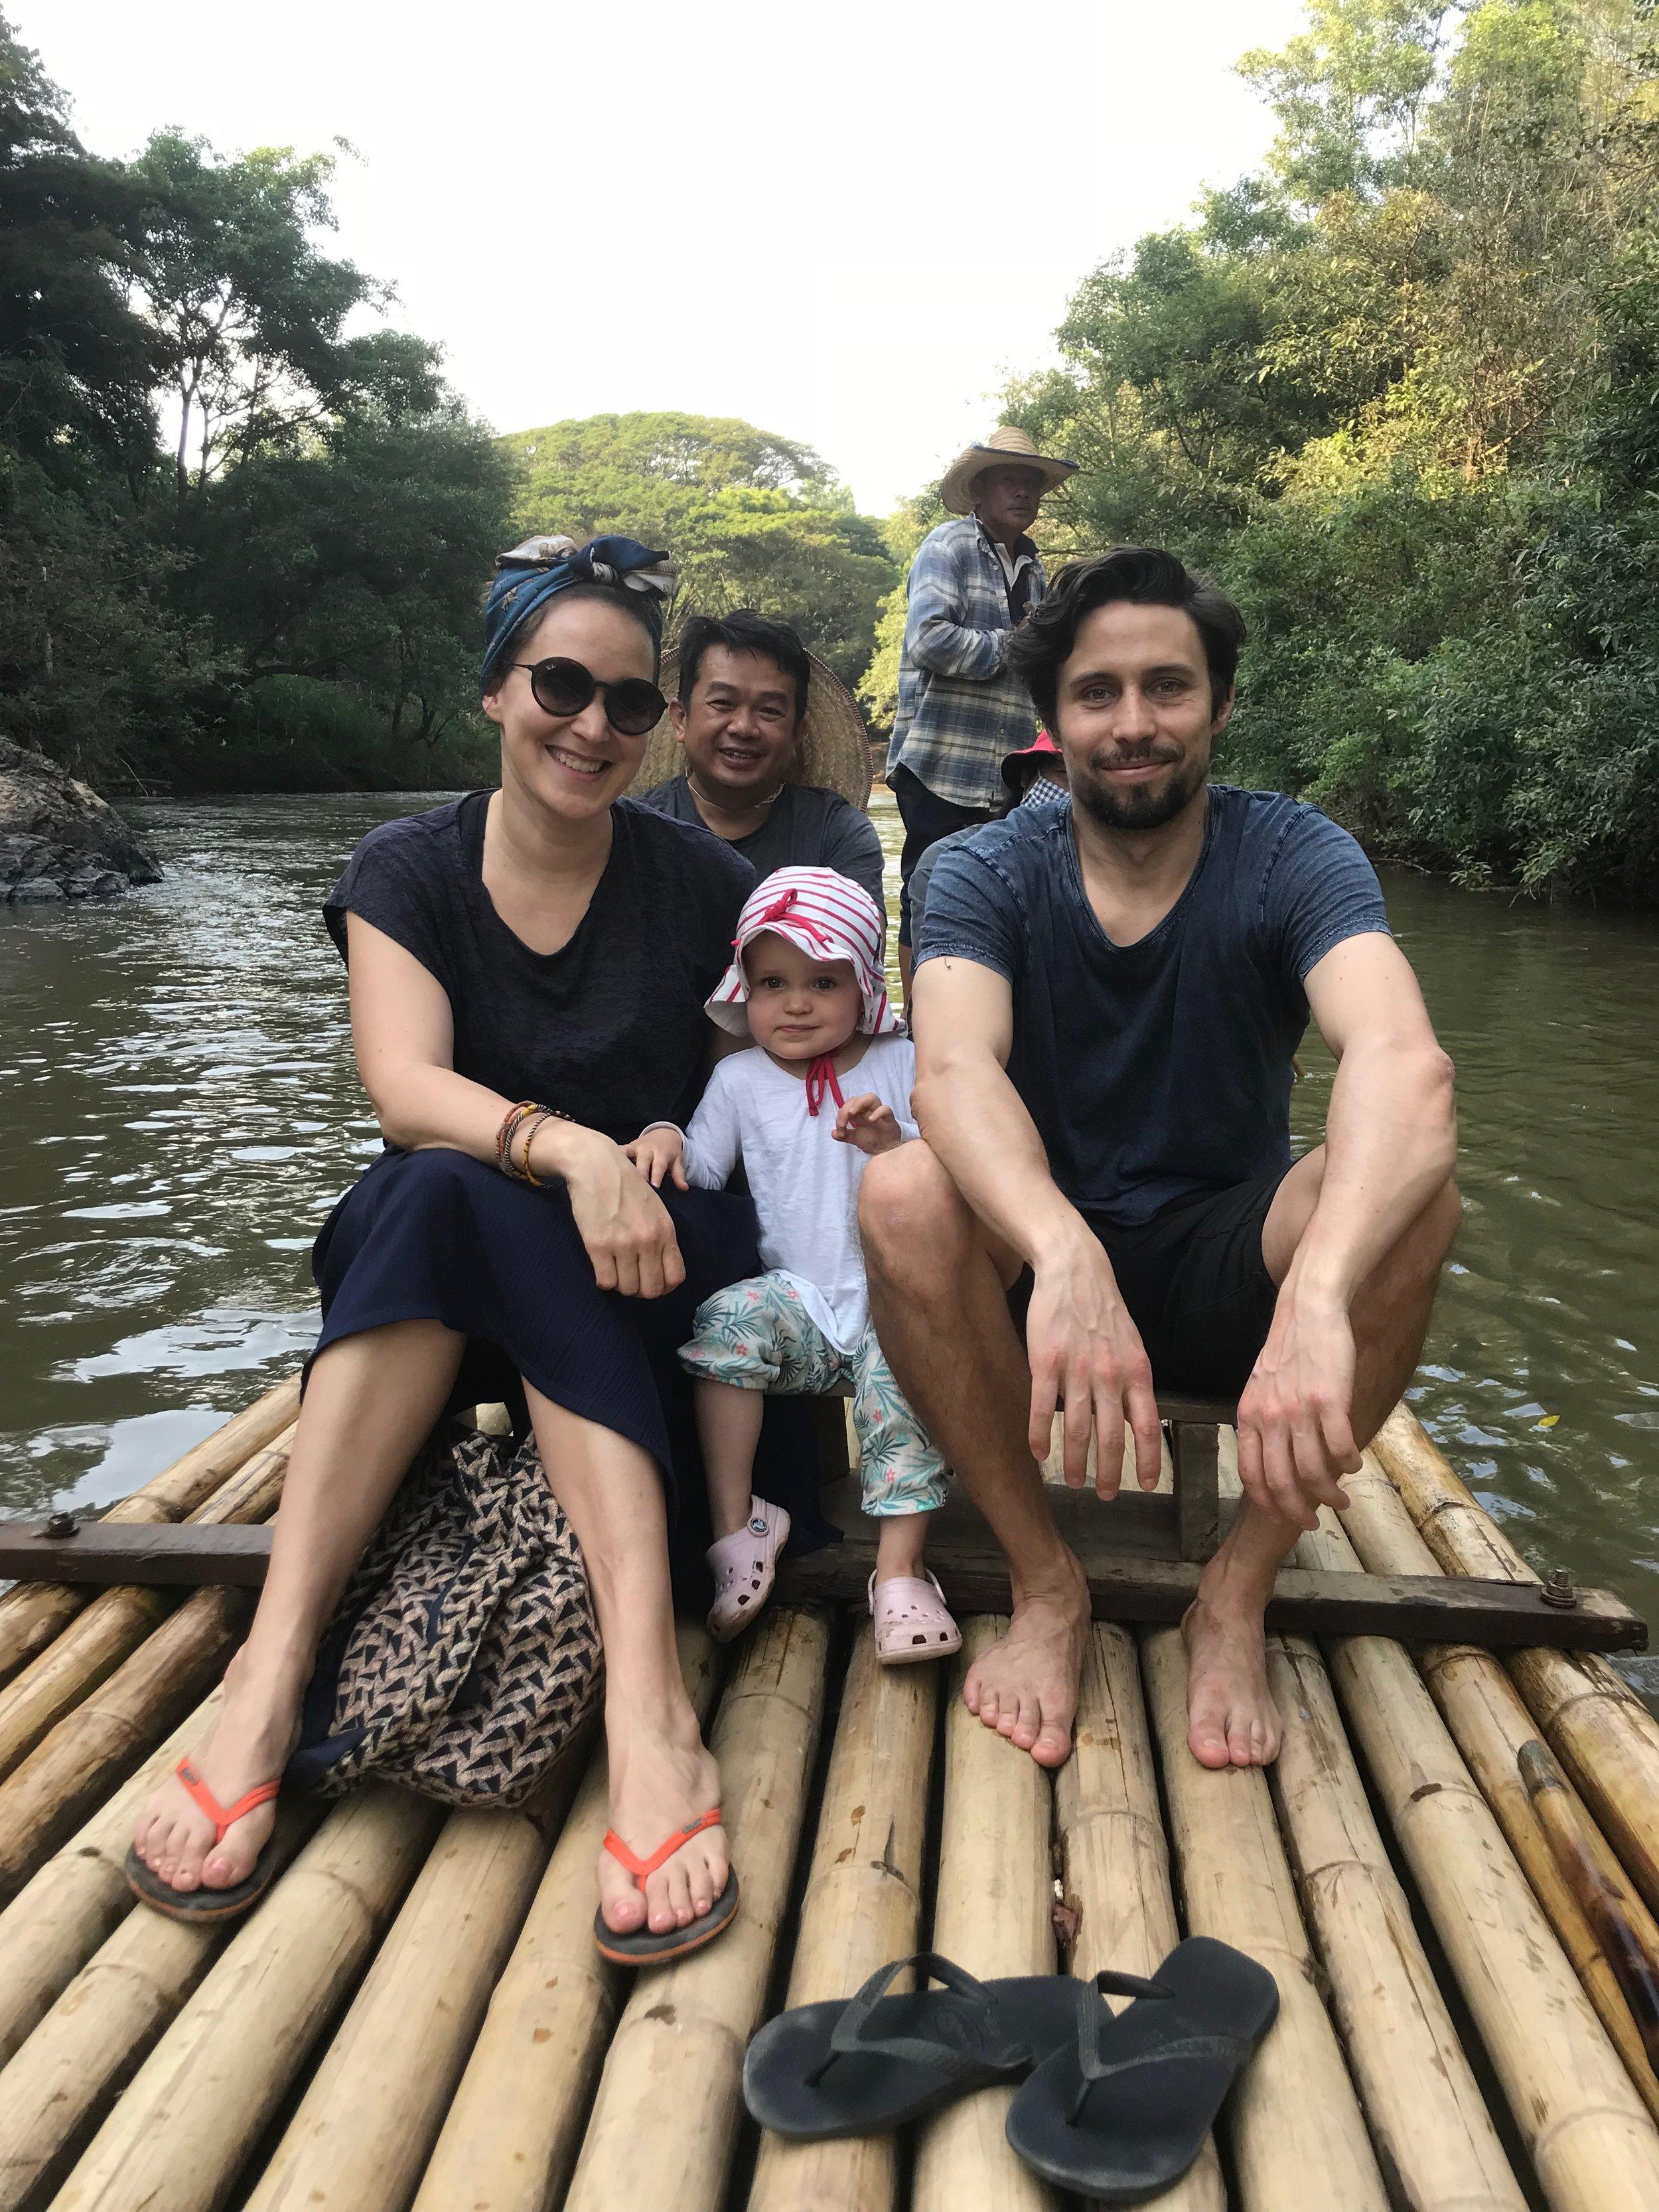 Annika, Lauri and their daughter in Tung Lakorn, Thailand.